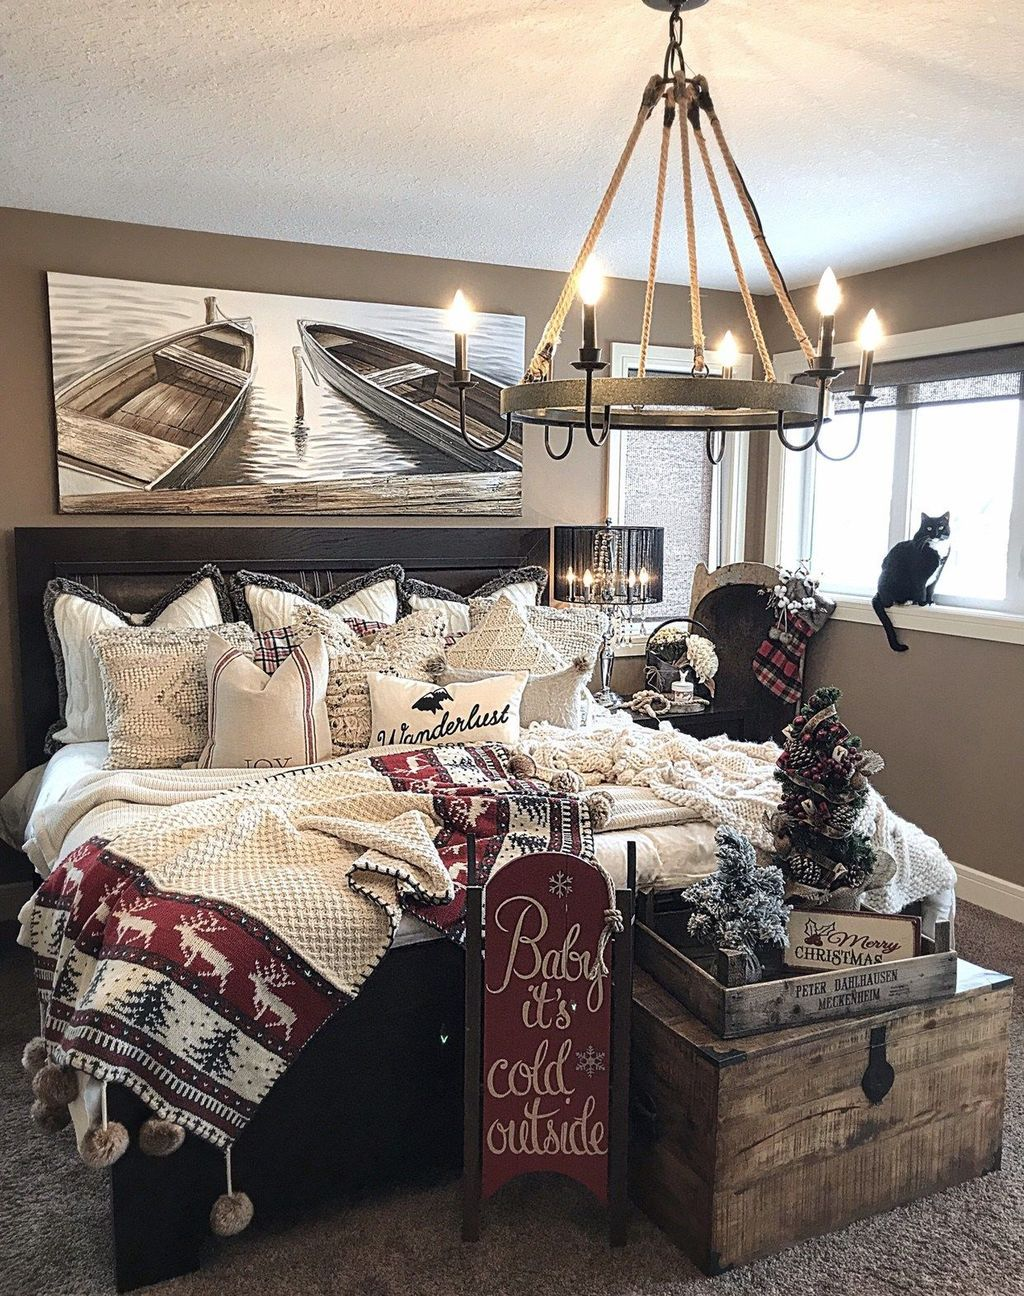 31 Nice Winter Bedding Ideas For Cozy Bedroom in 2020